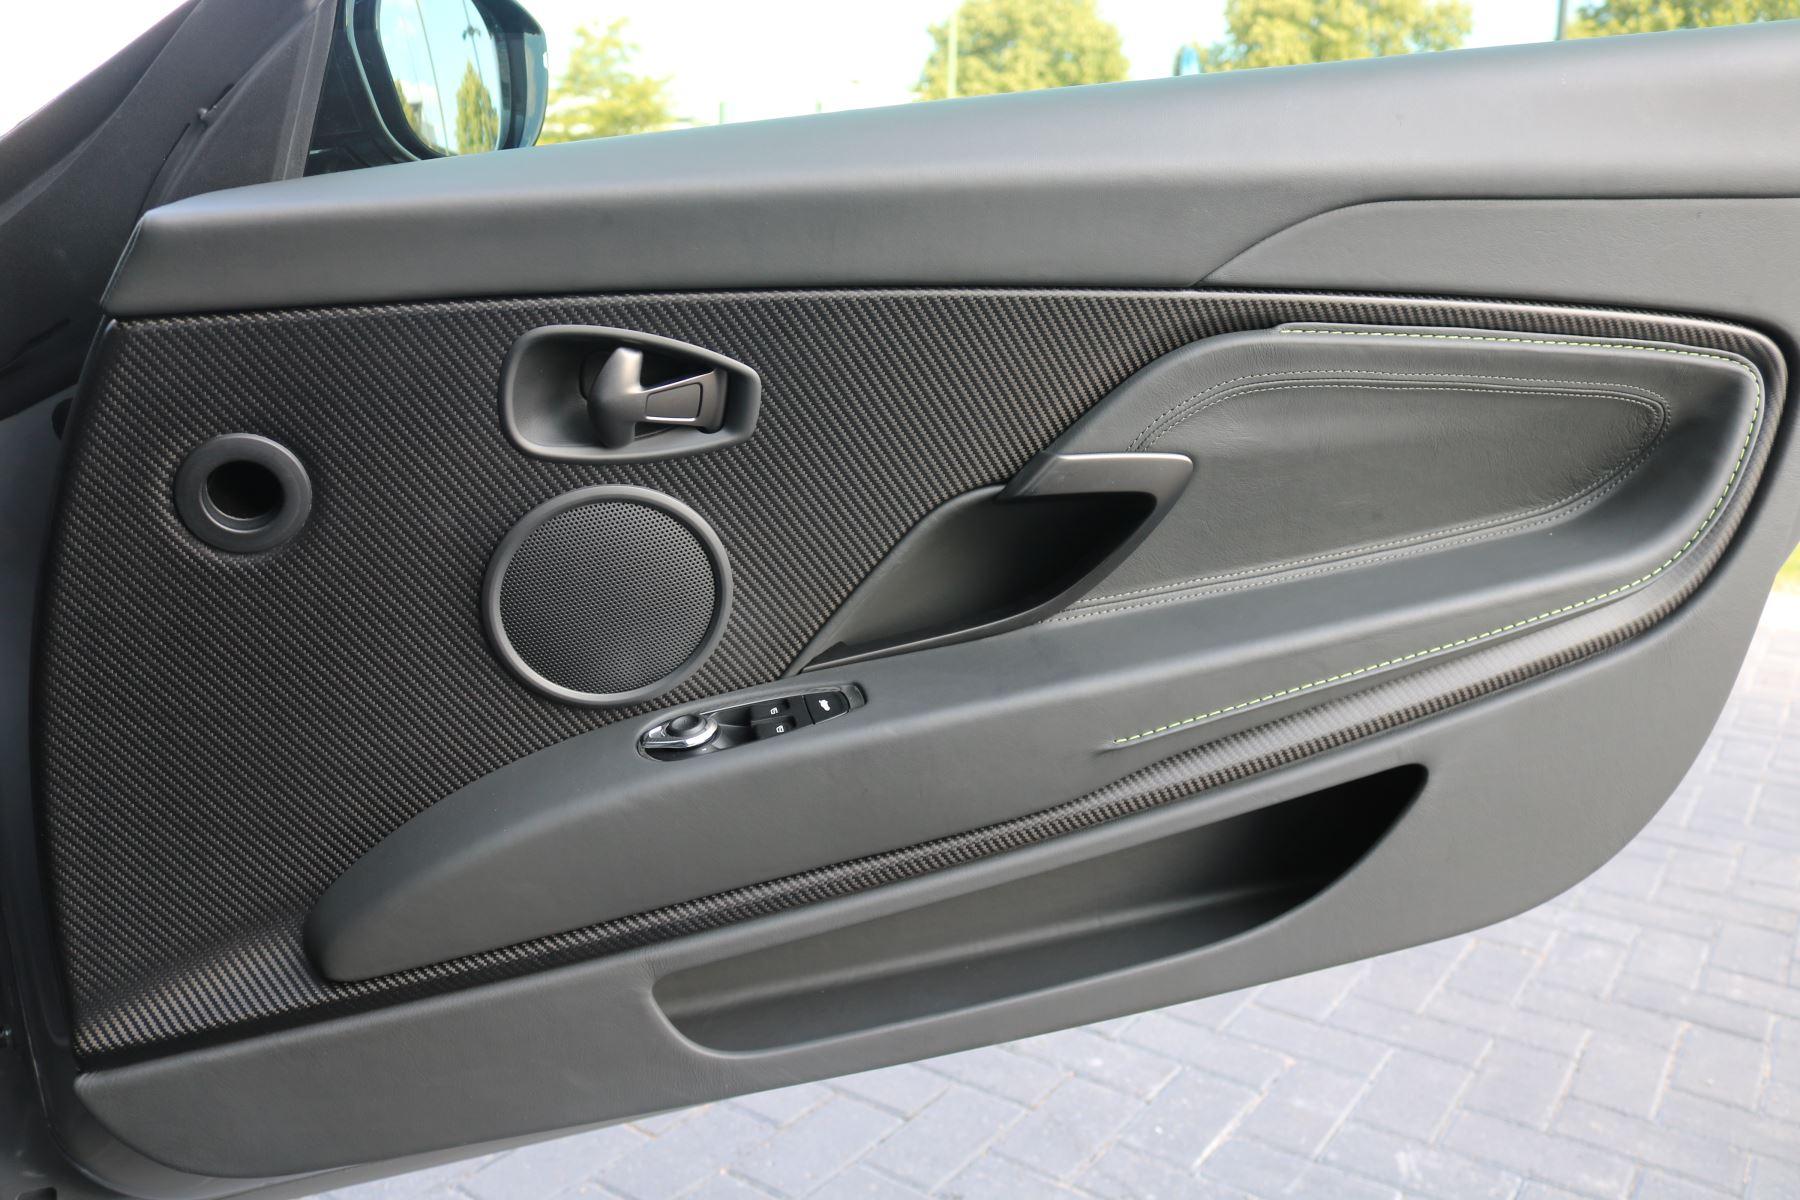 Aston Martin DB11 V12 AMR 2dr Touchtronic image 16